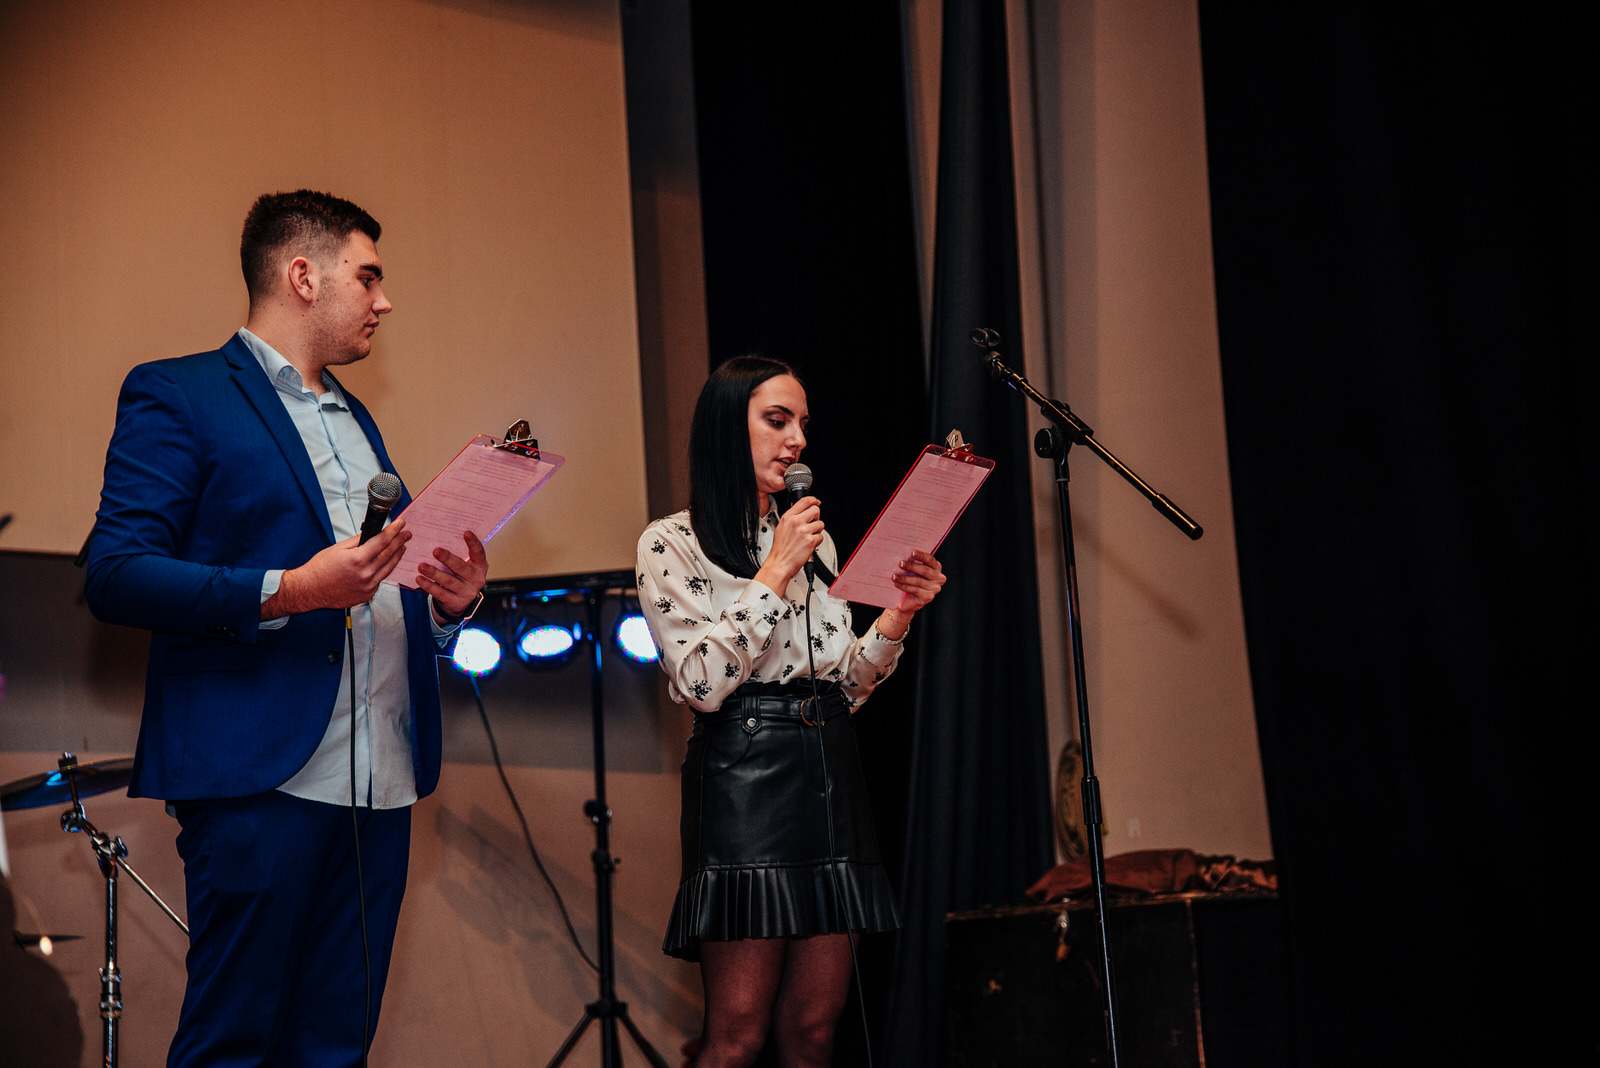 LIKACLUB_Najljepši-glas-za-Pčelice_2019-12